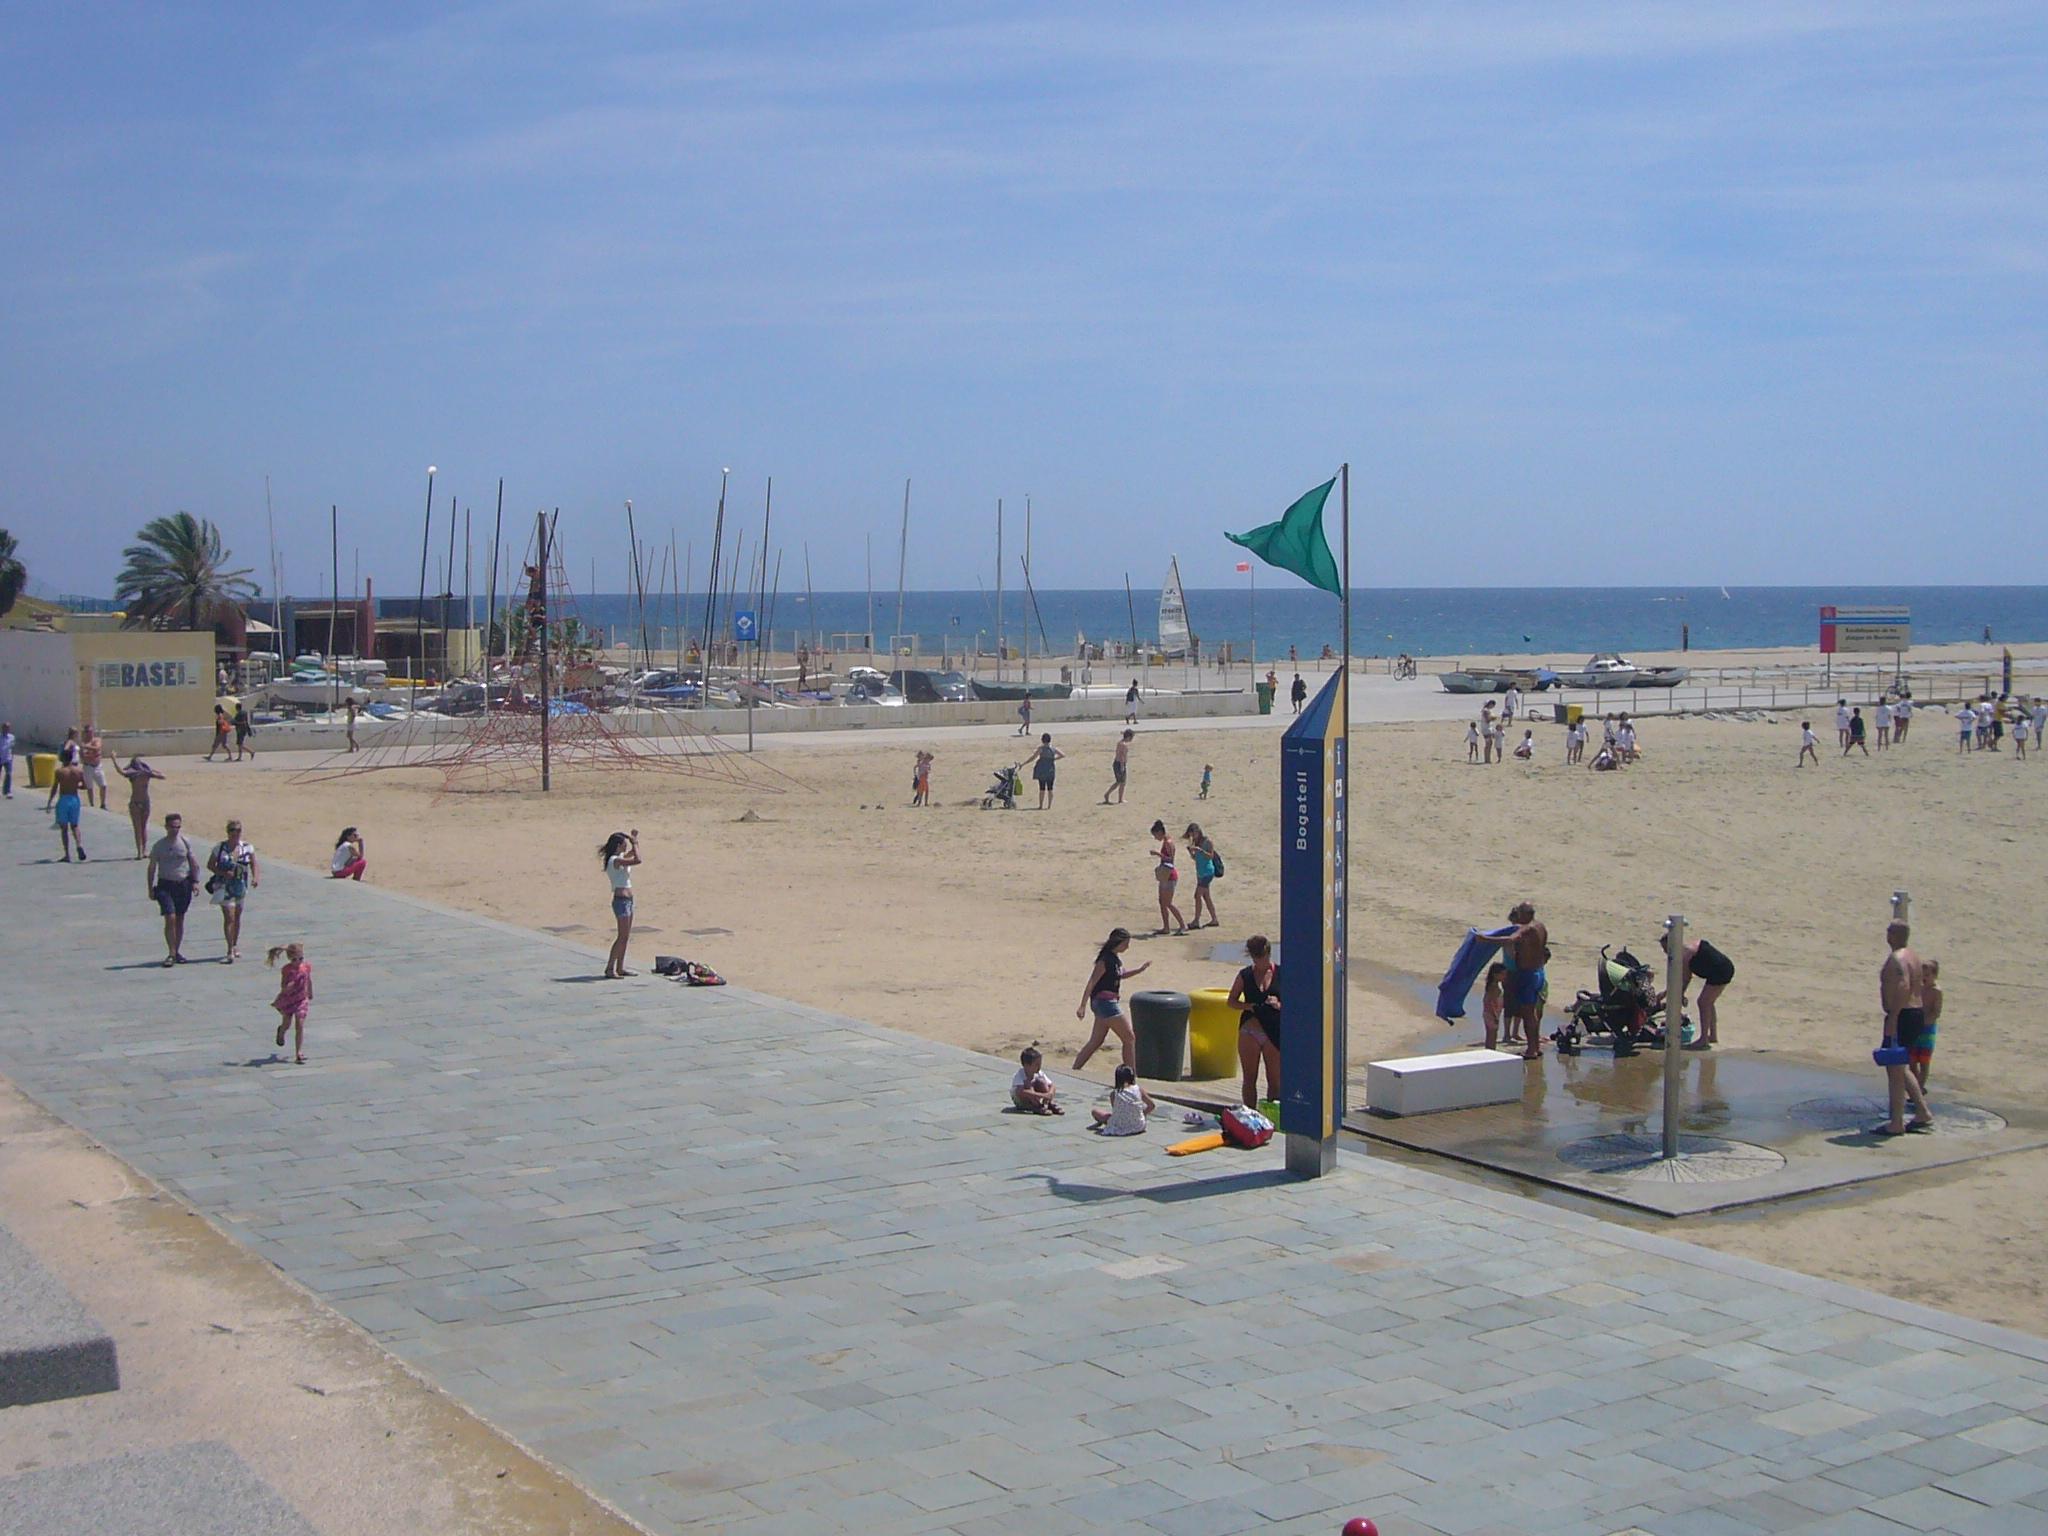 File:Platja del Bogatell (Barcelona) 01.JPG - Wikimedia Commons